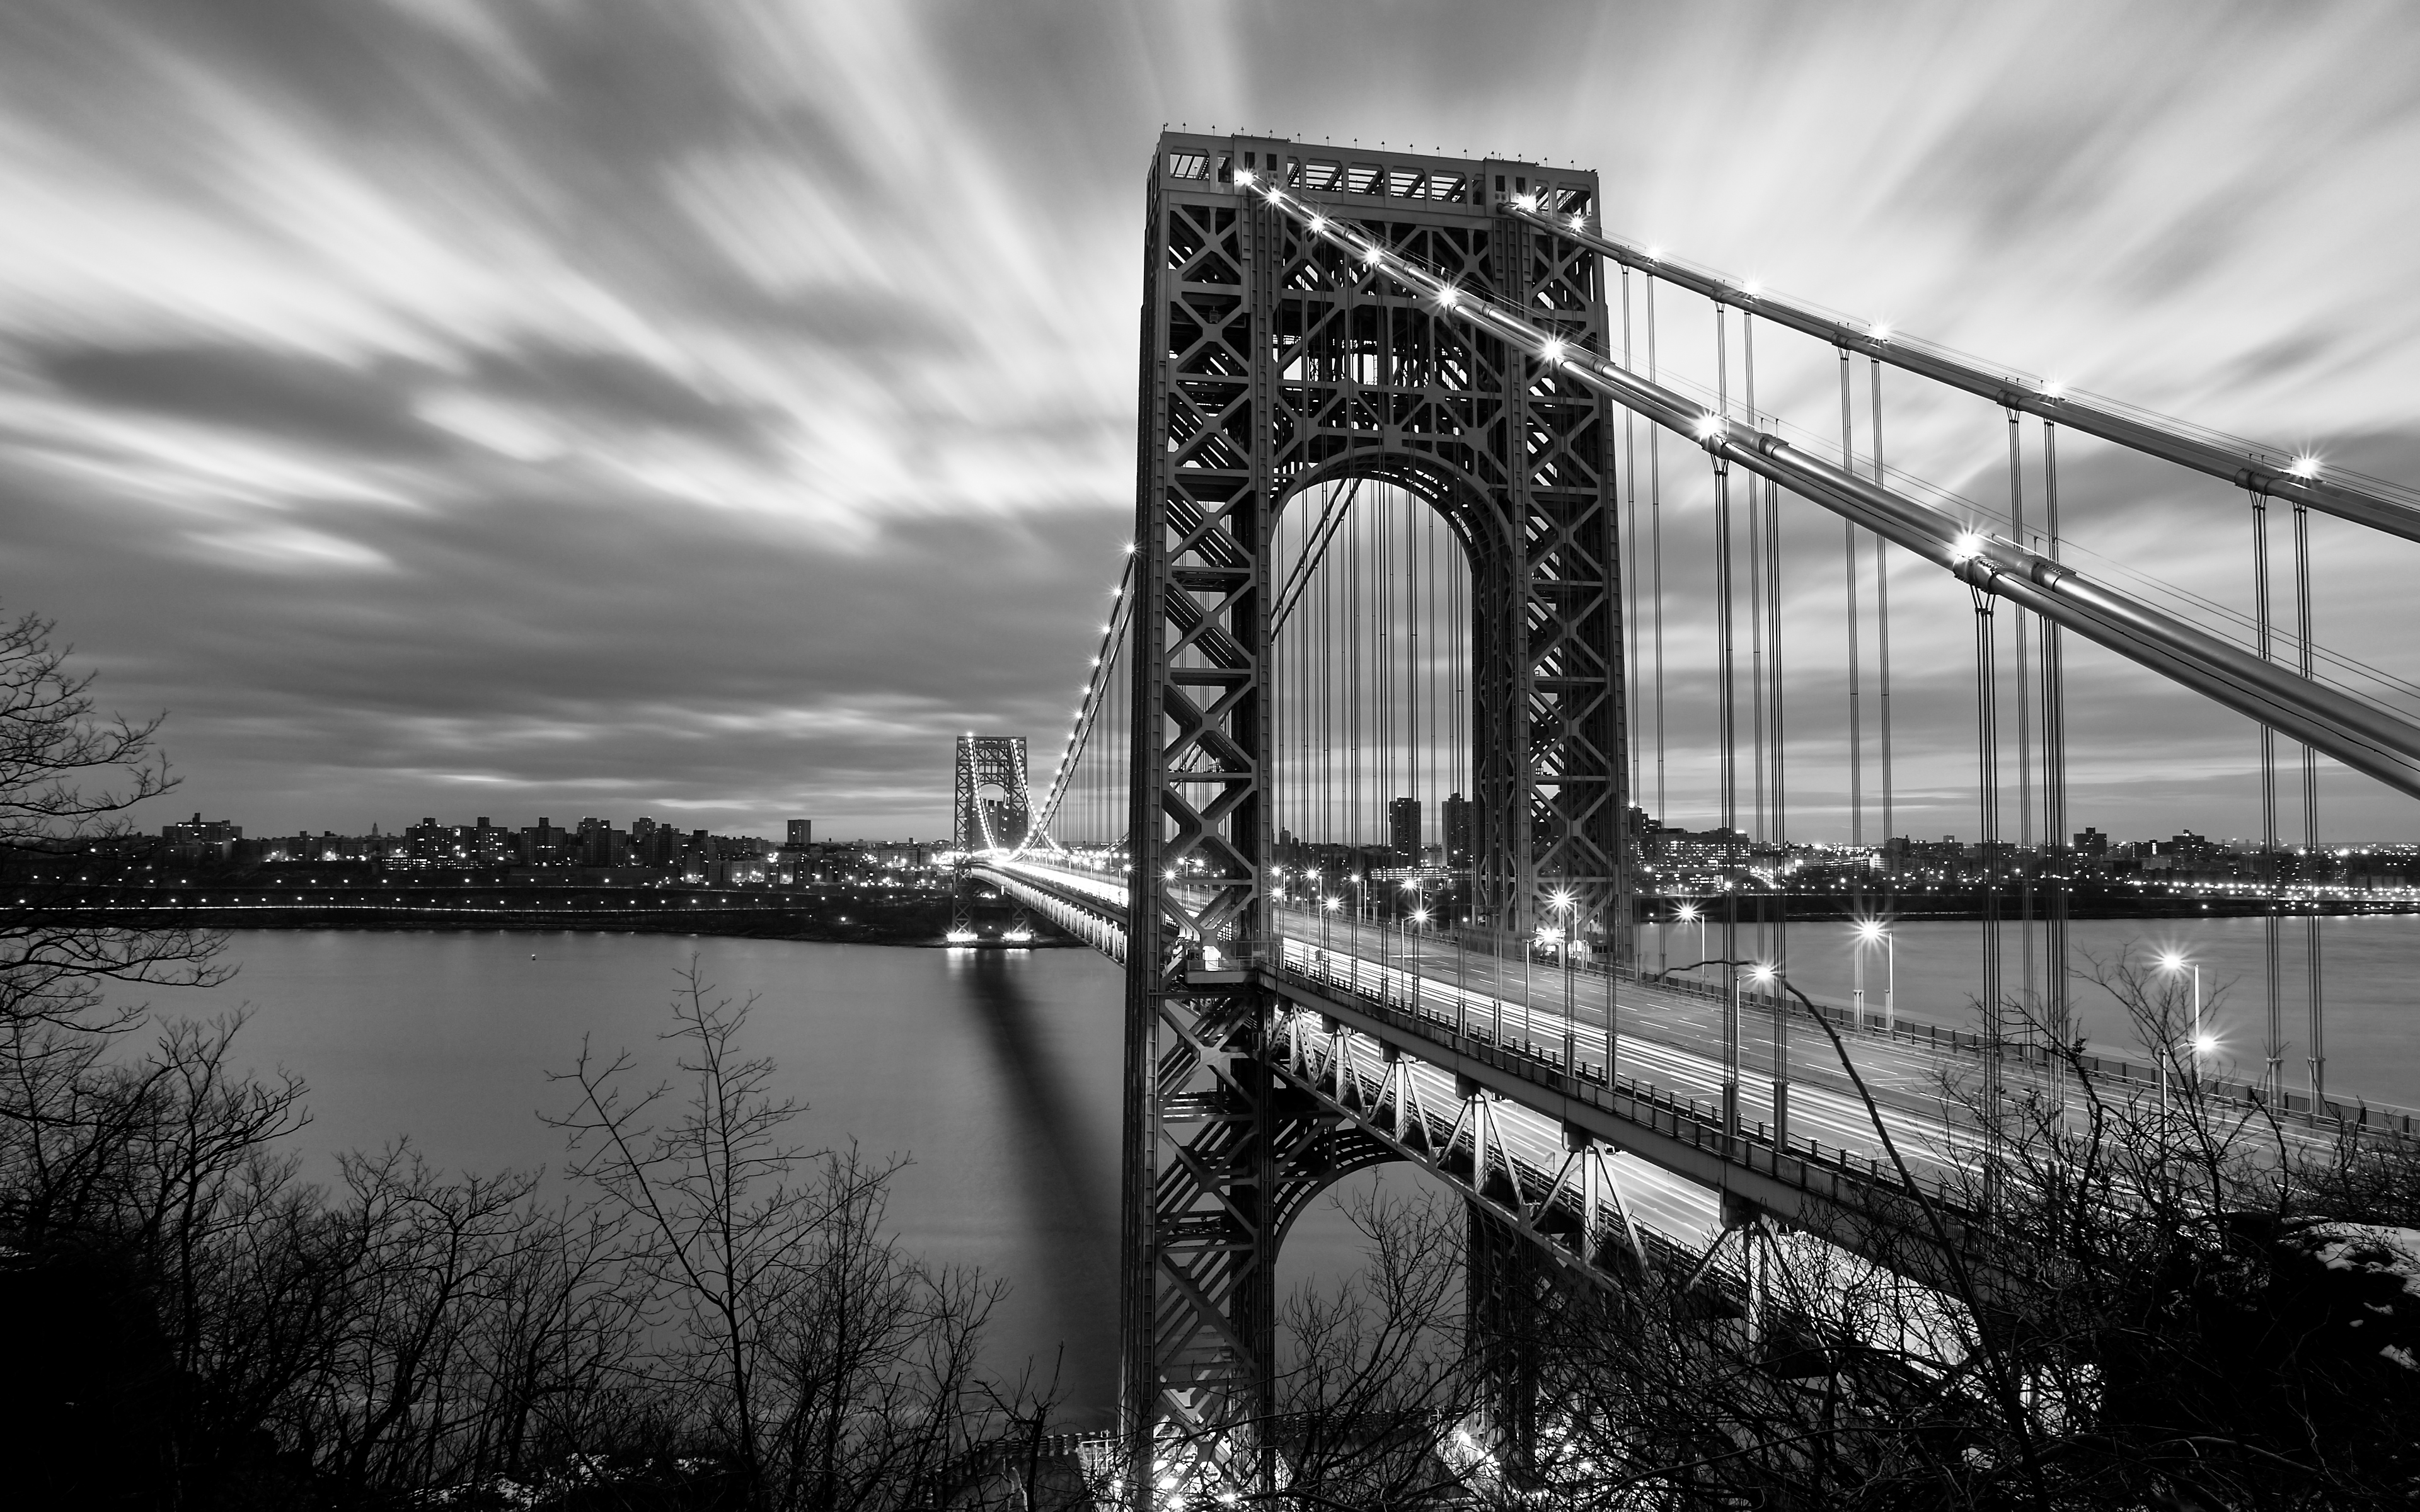 George Washington Bridge 4k Ultra HD Wallpaper Background Image 3840x2400